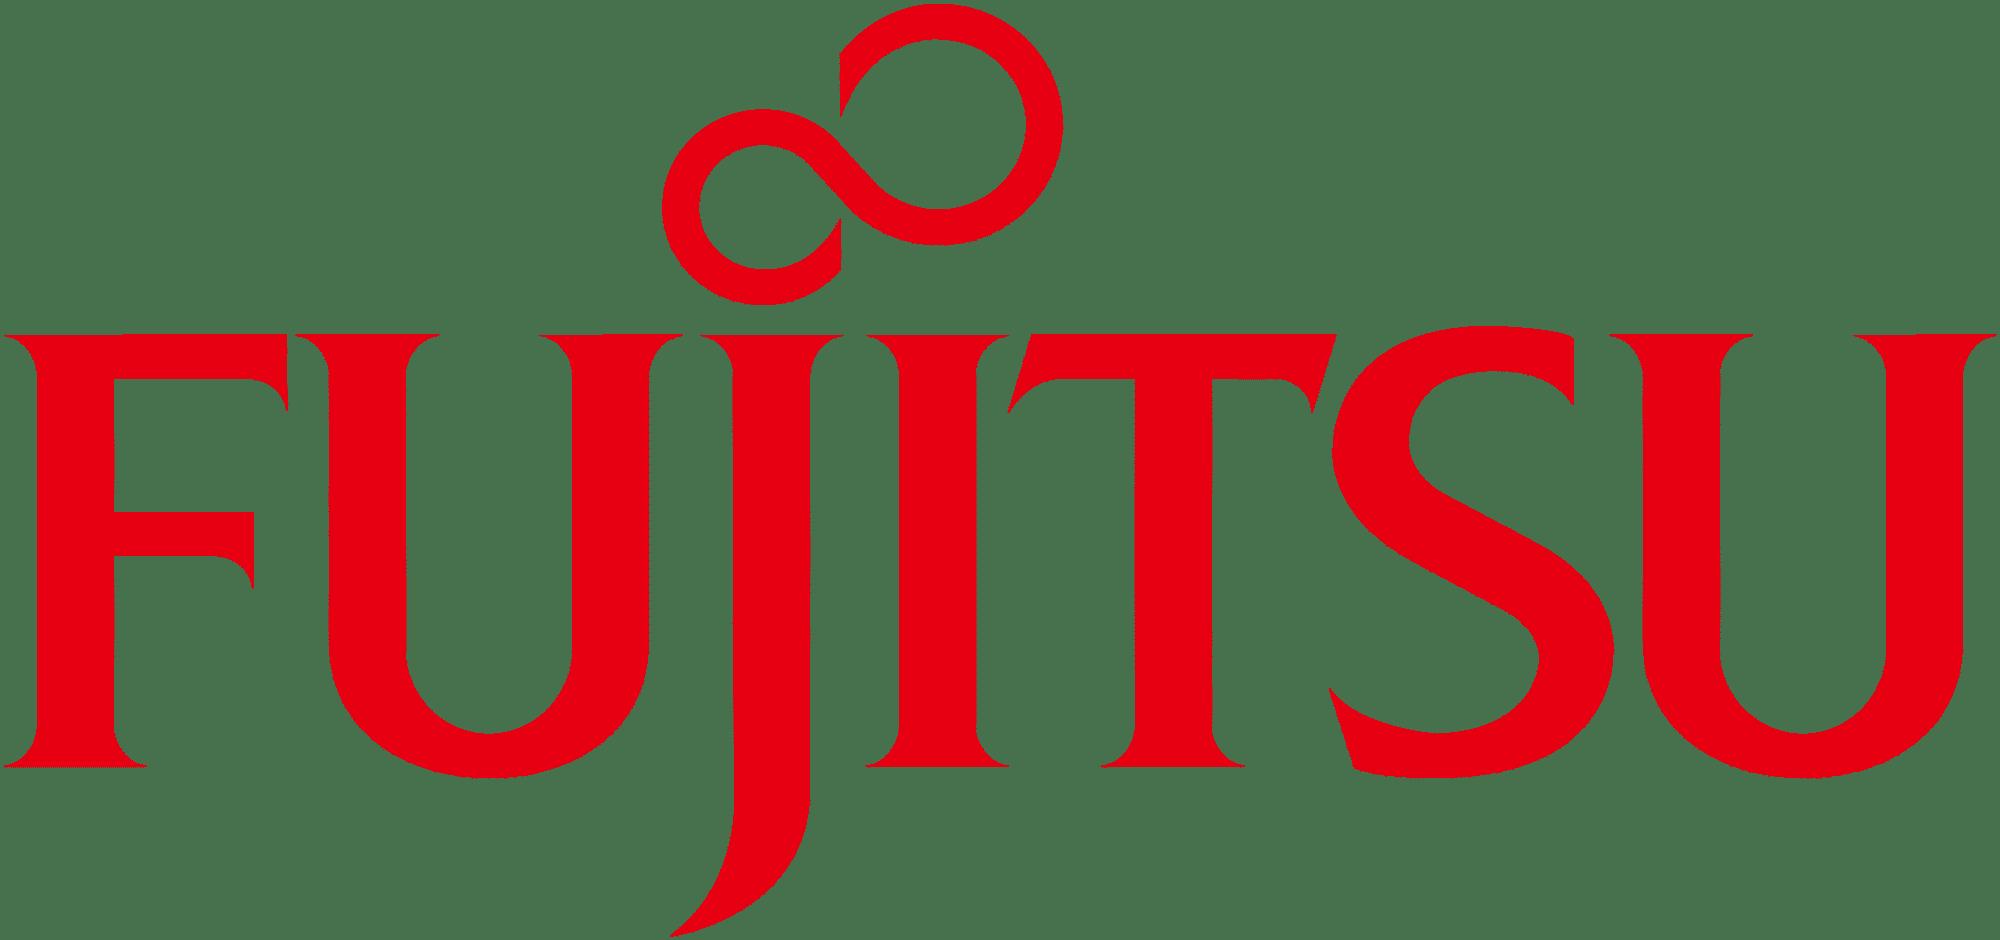 my esIT Systems - Fujitsu